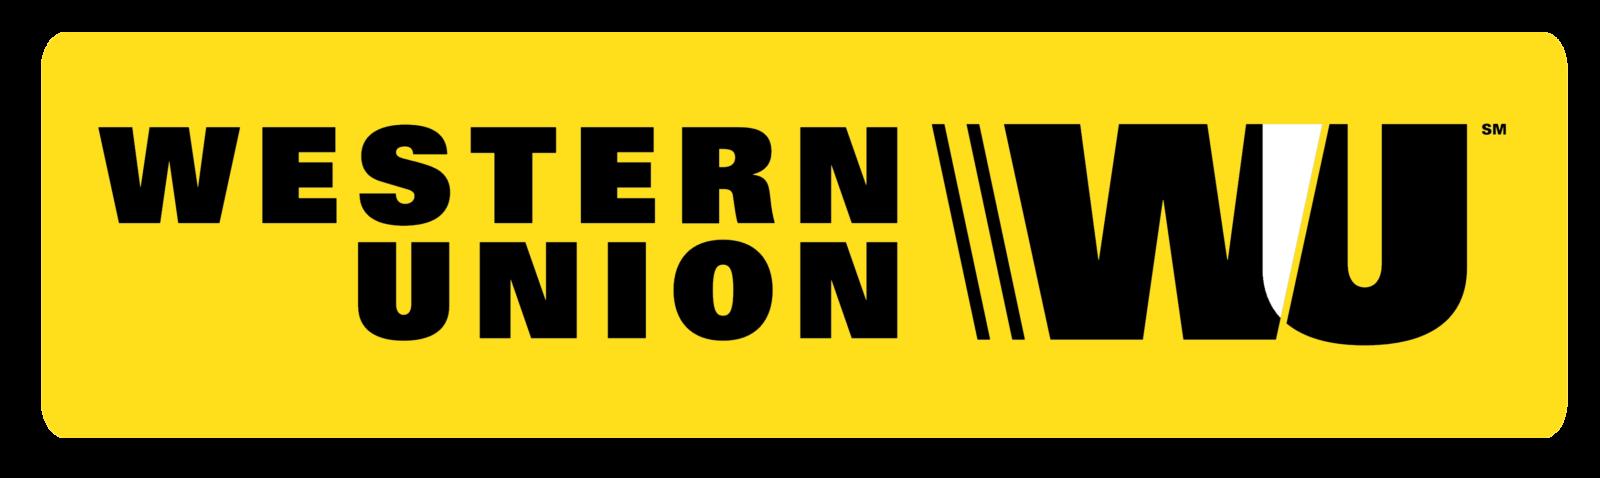 Western Union anastasia rufina